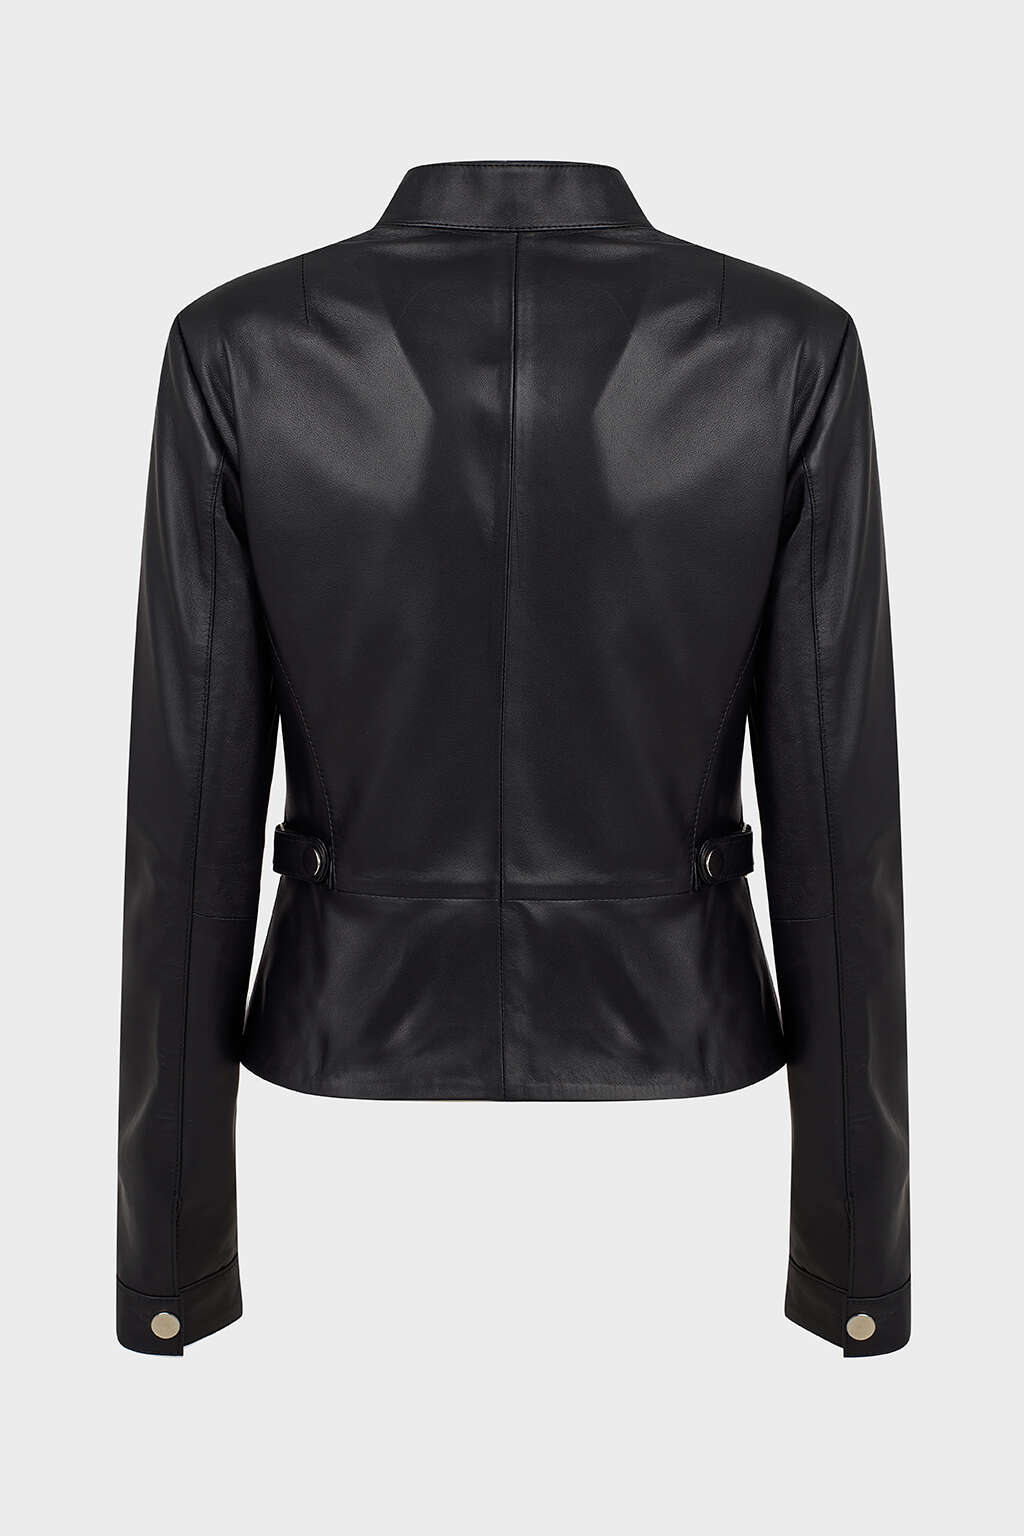 Back of Jet Black Leather Moto Jacket